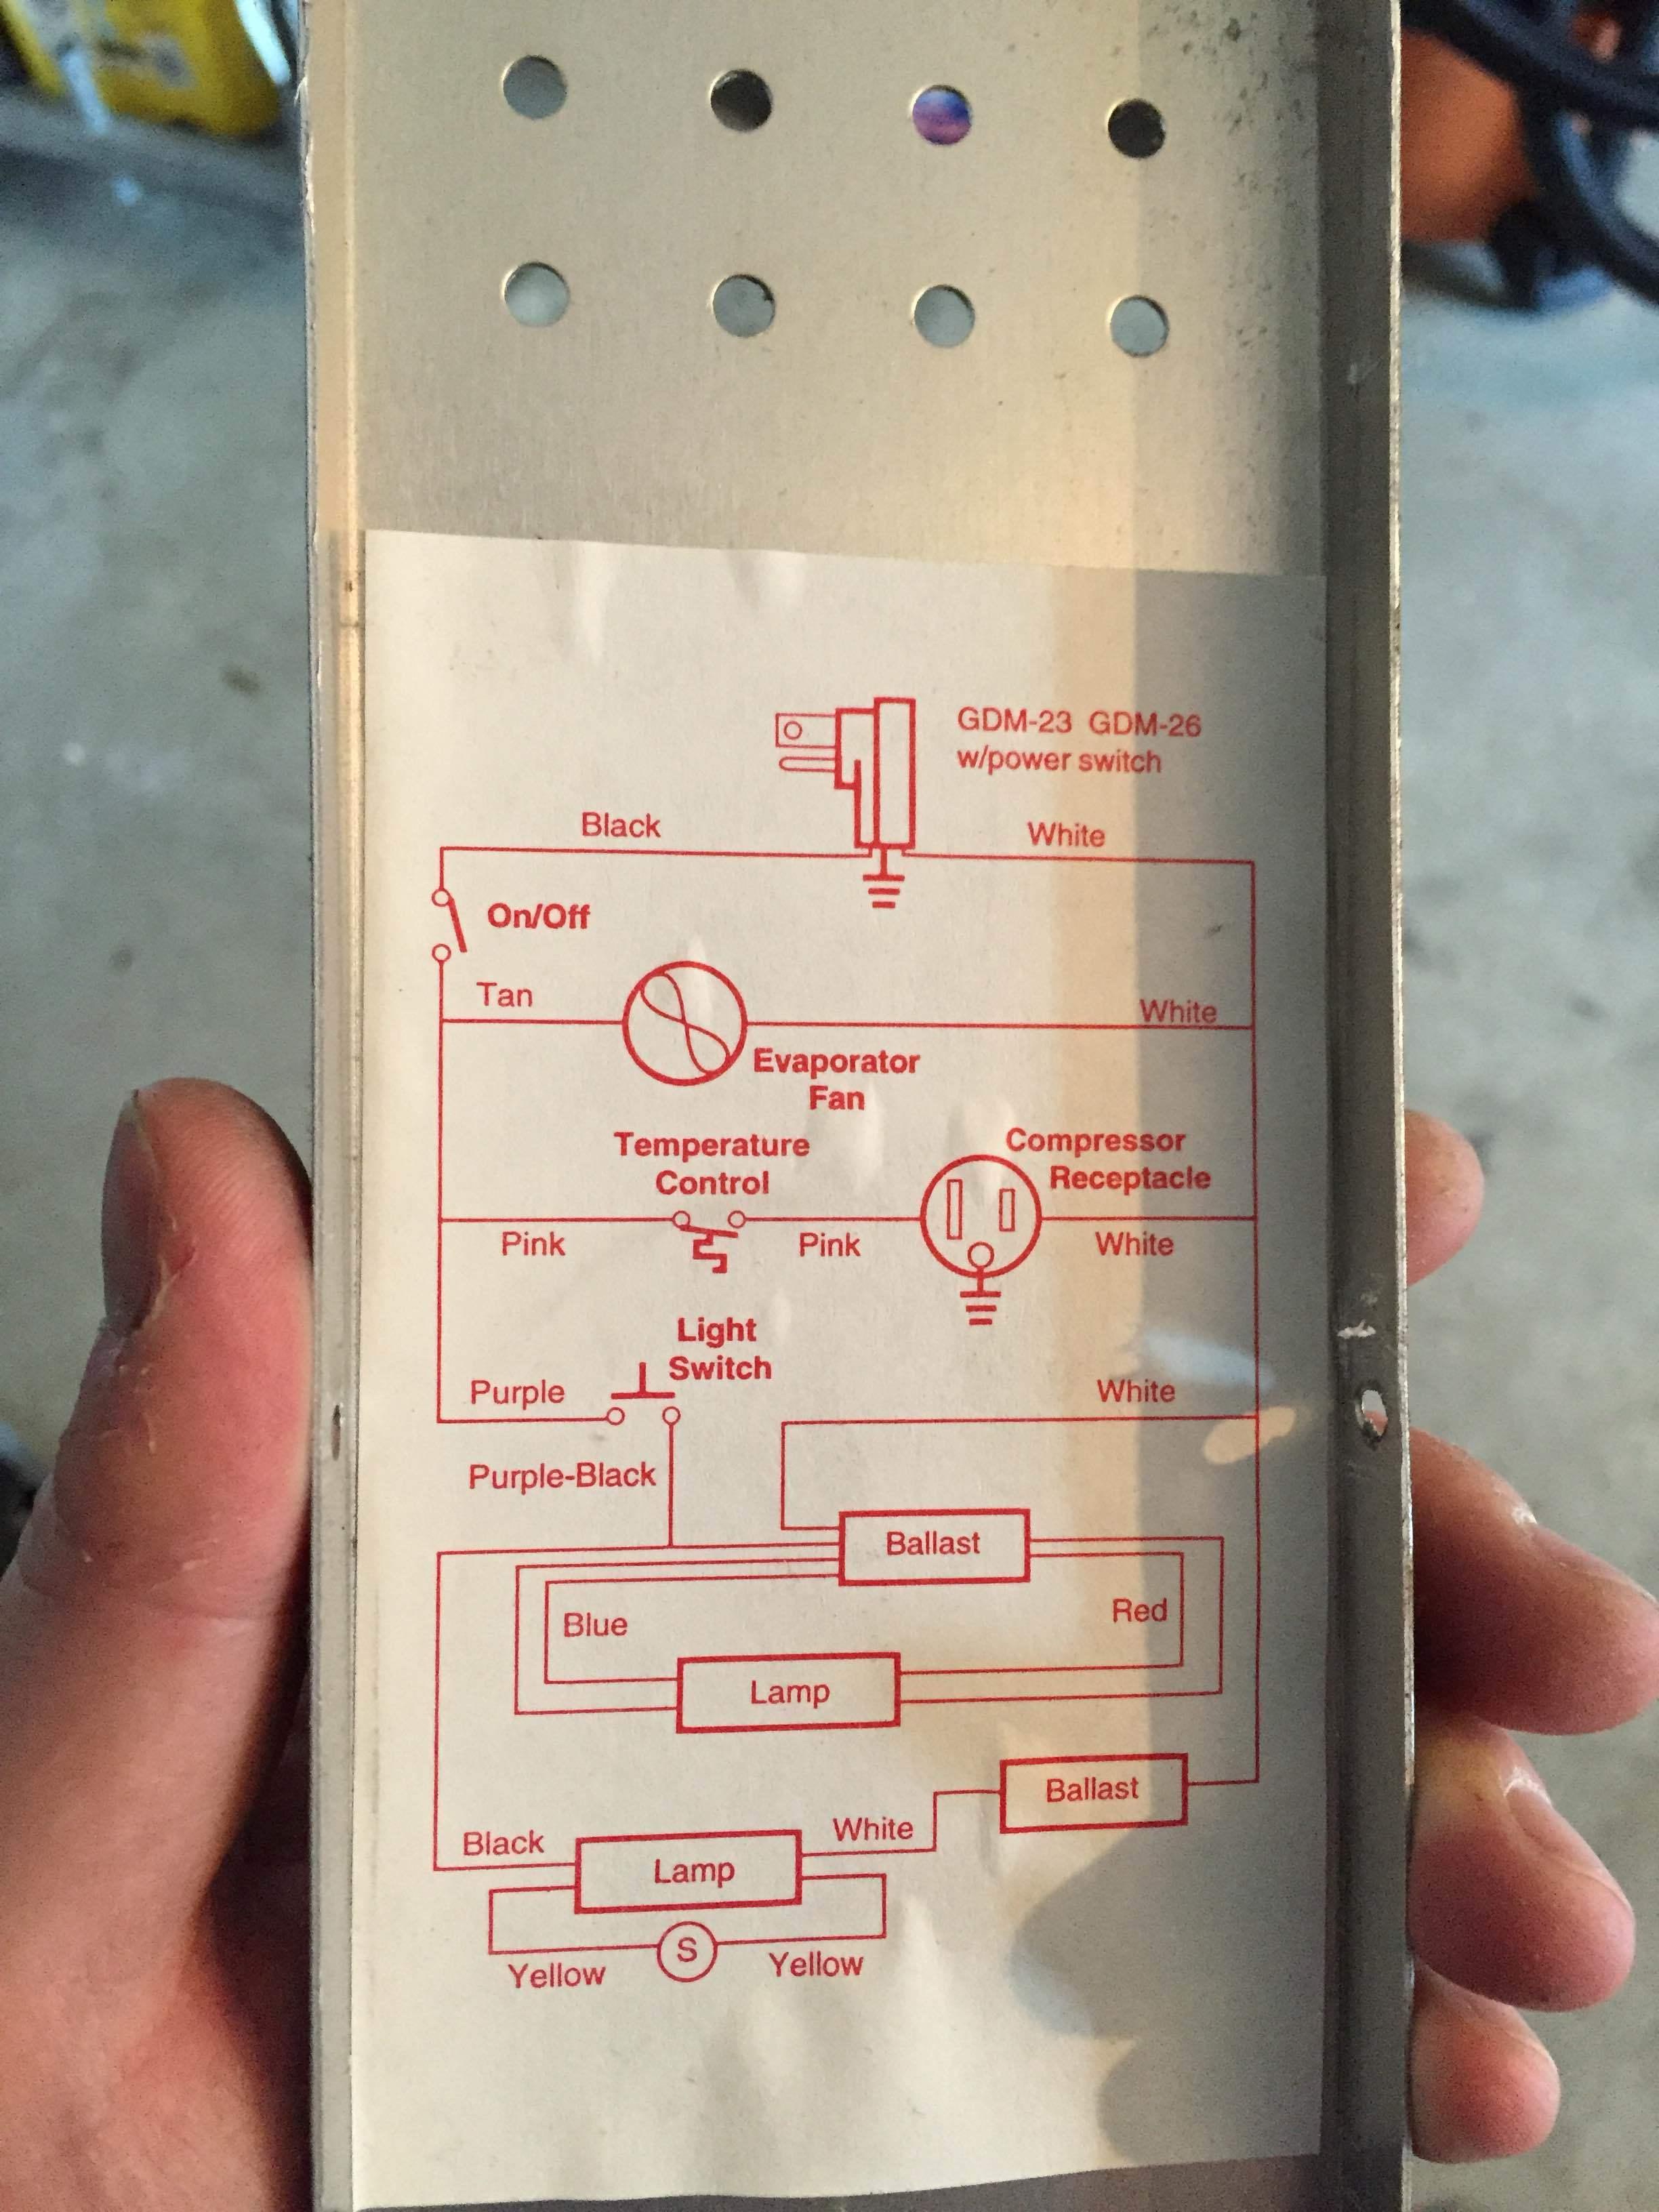 T 49F True Freezer Wiring Diagram | Wiring Diagram - True Freezer T 49F Wiring Diagram